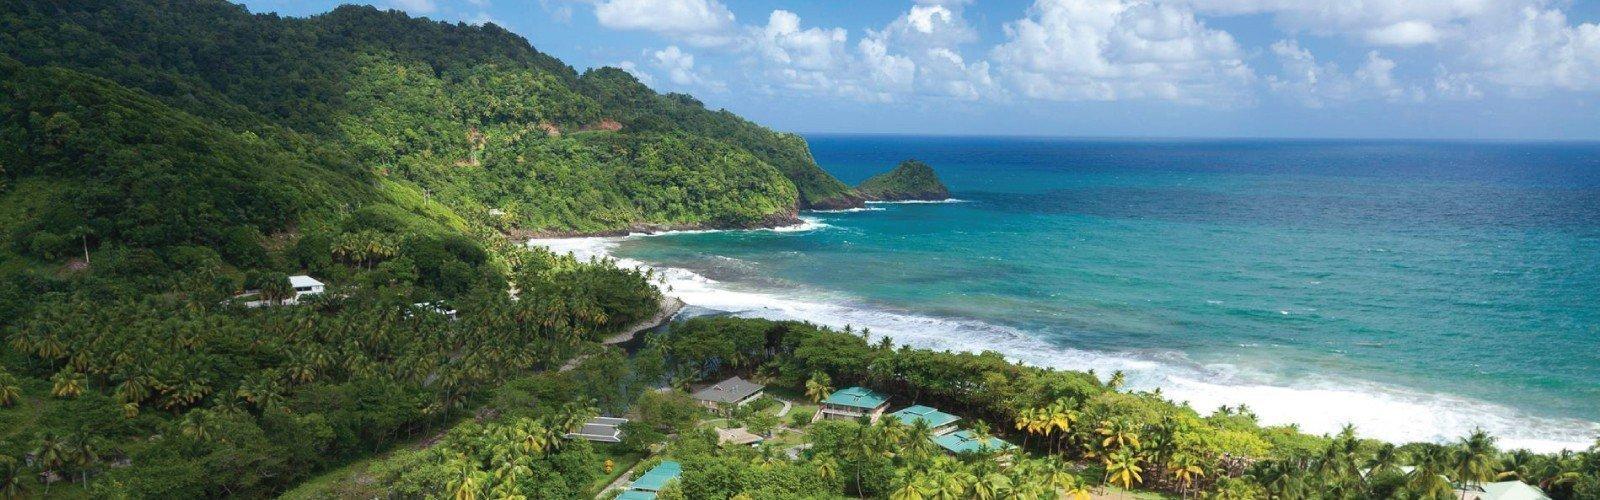 Dominica CBI A Success despite Natural Disaster Declares ECCB!